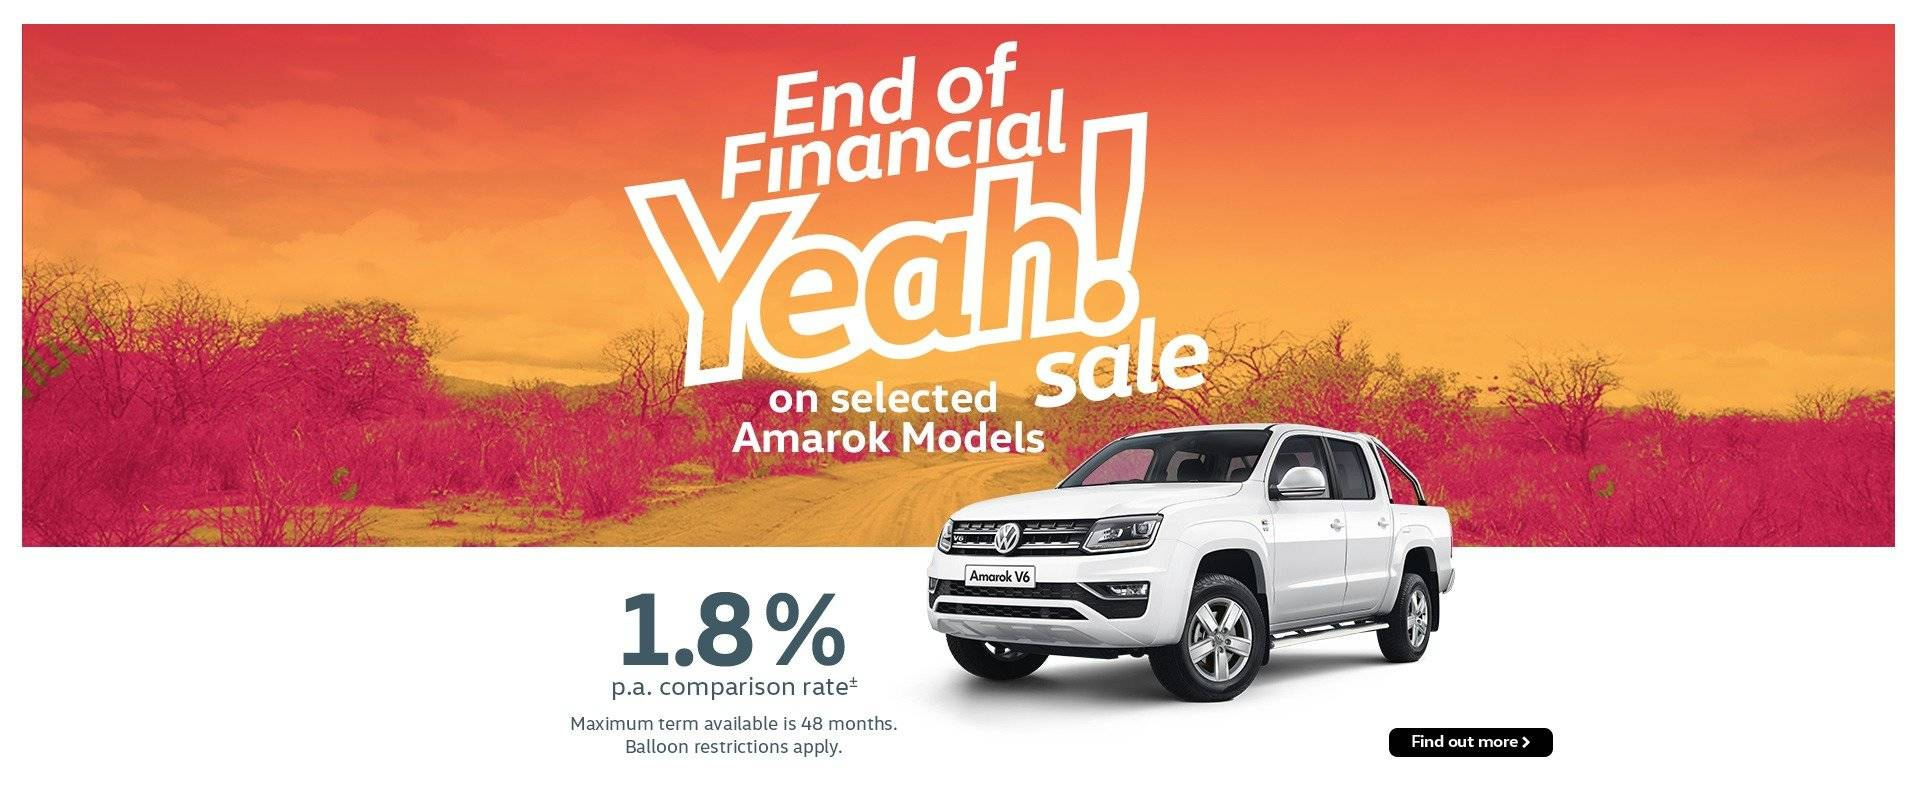 Commercial Finance Offer